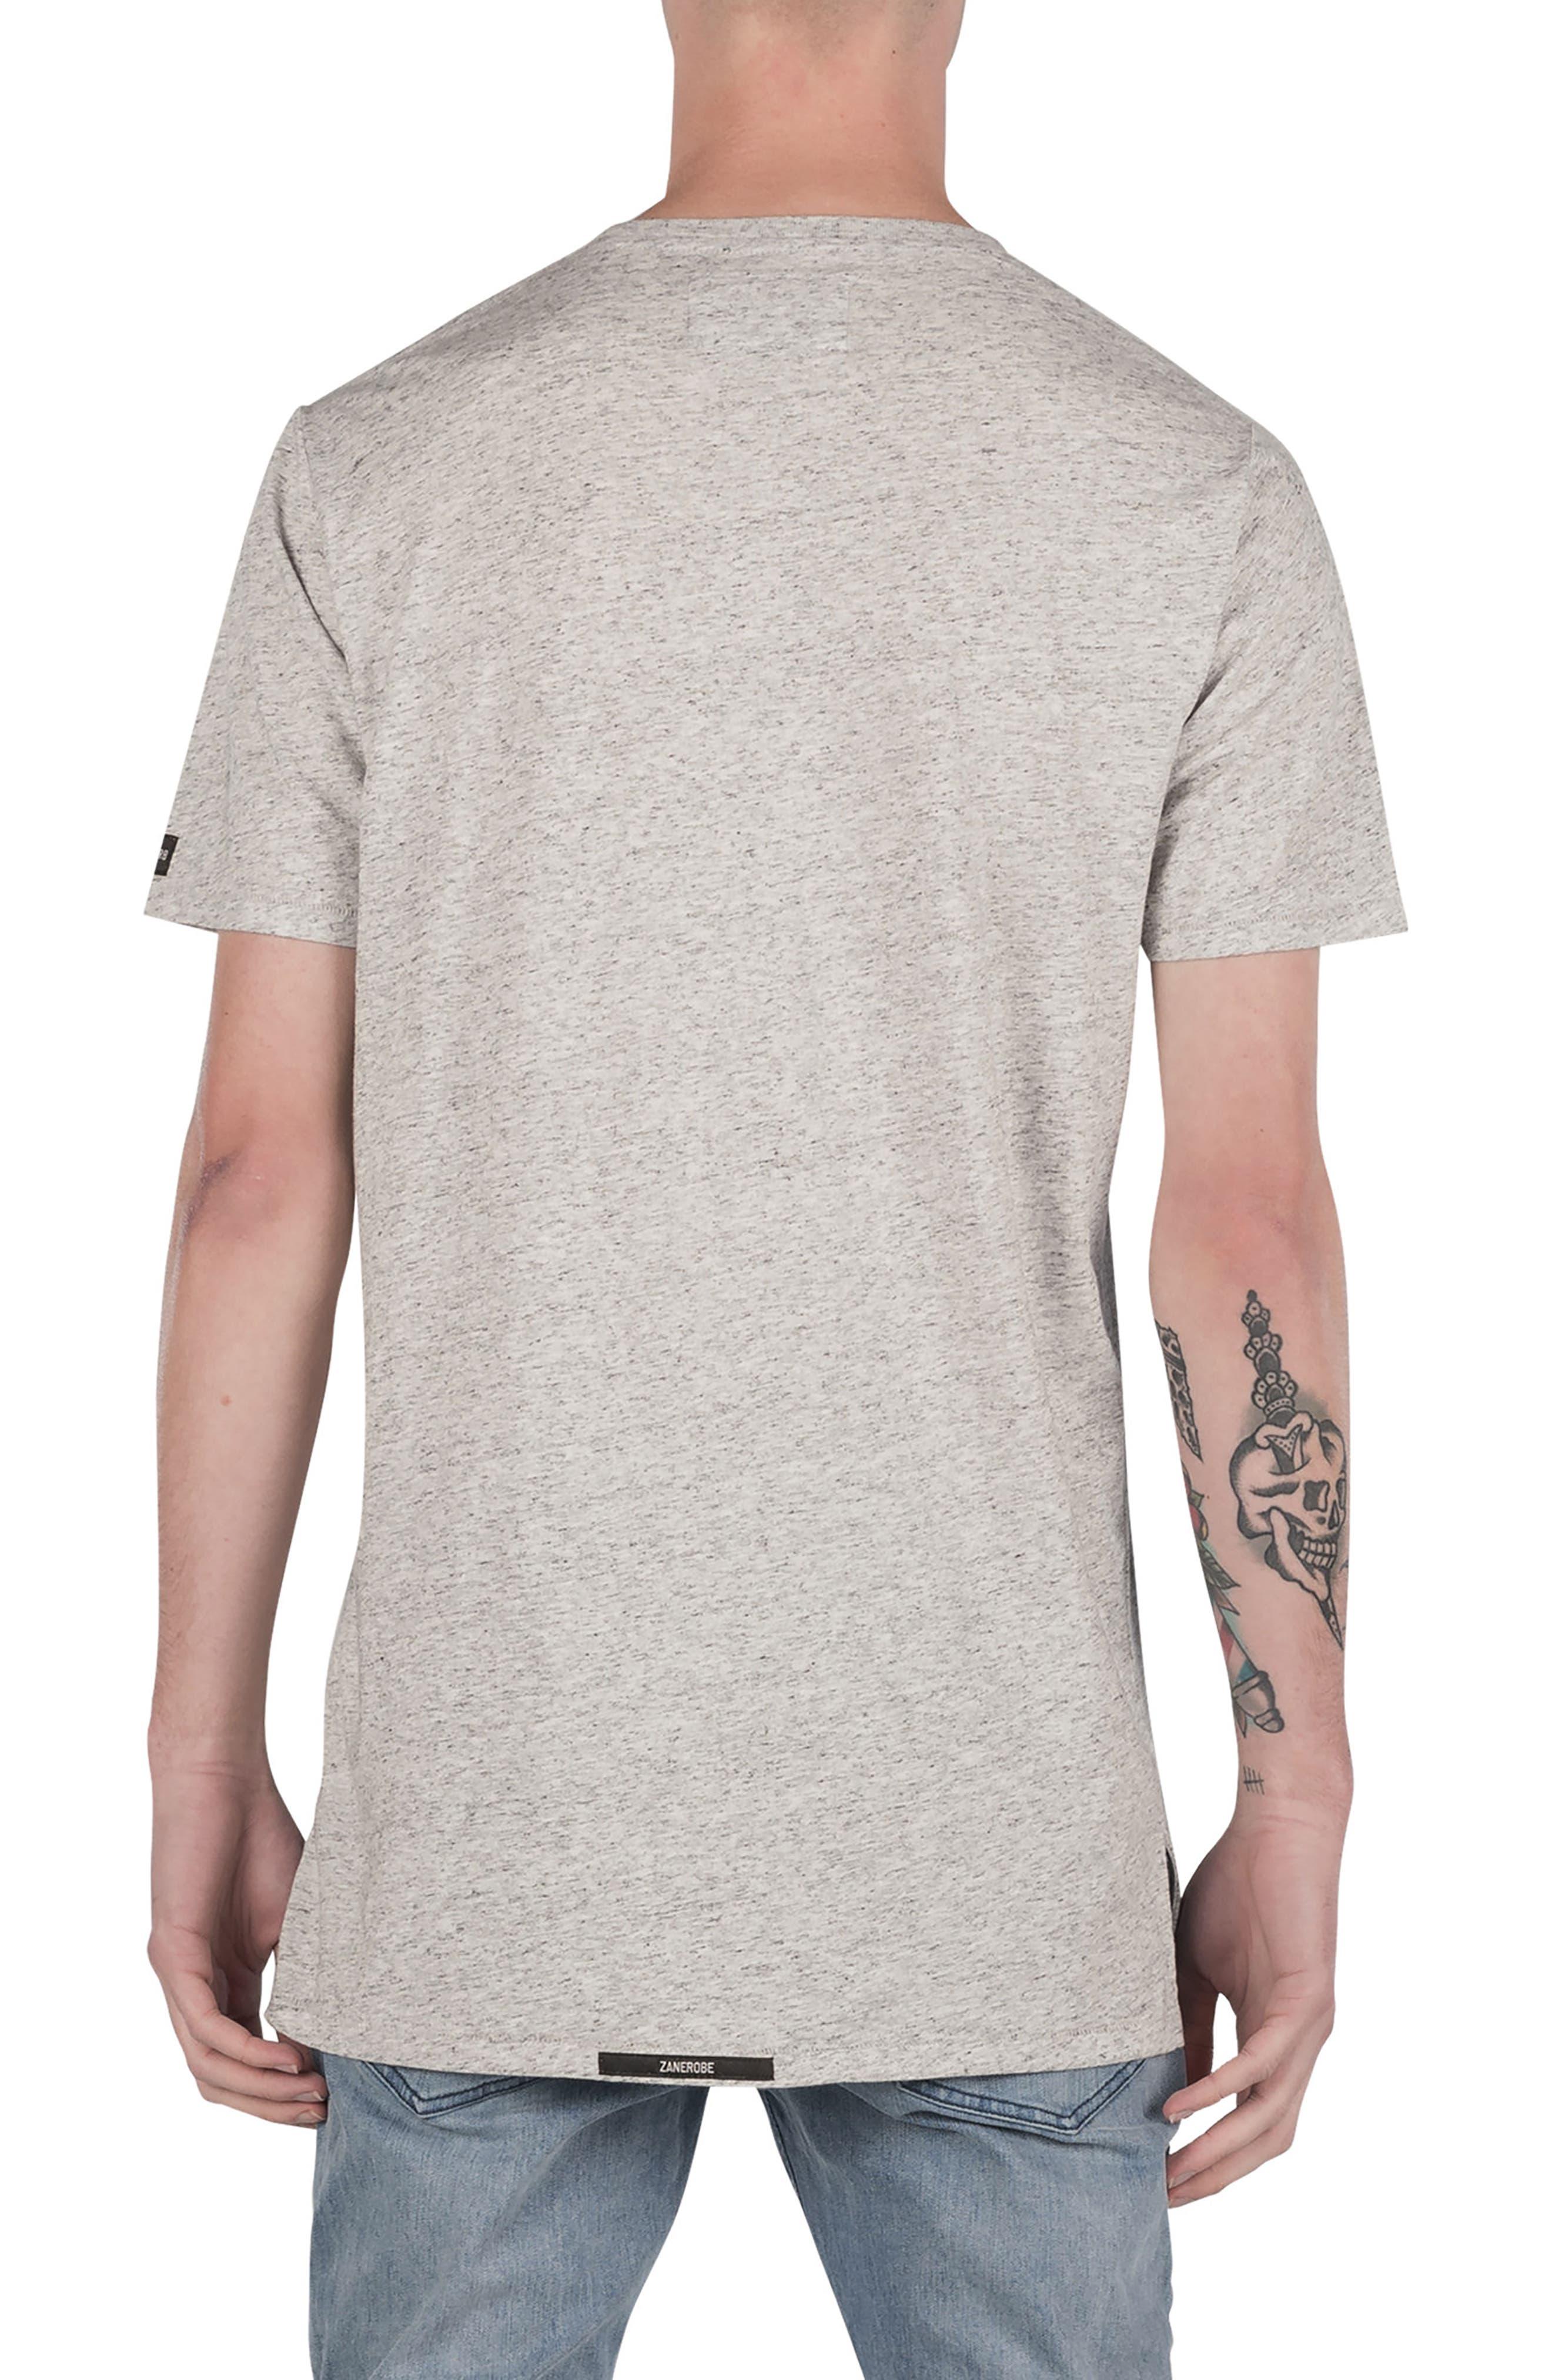 Flintlock T-Shirt,                             Alternate thumbnail 2, color,                             Storm Marl